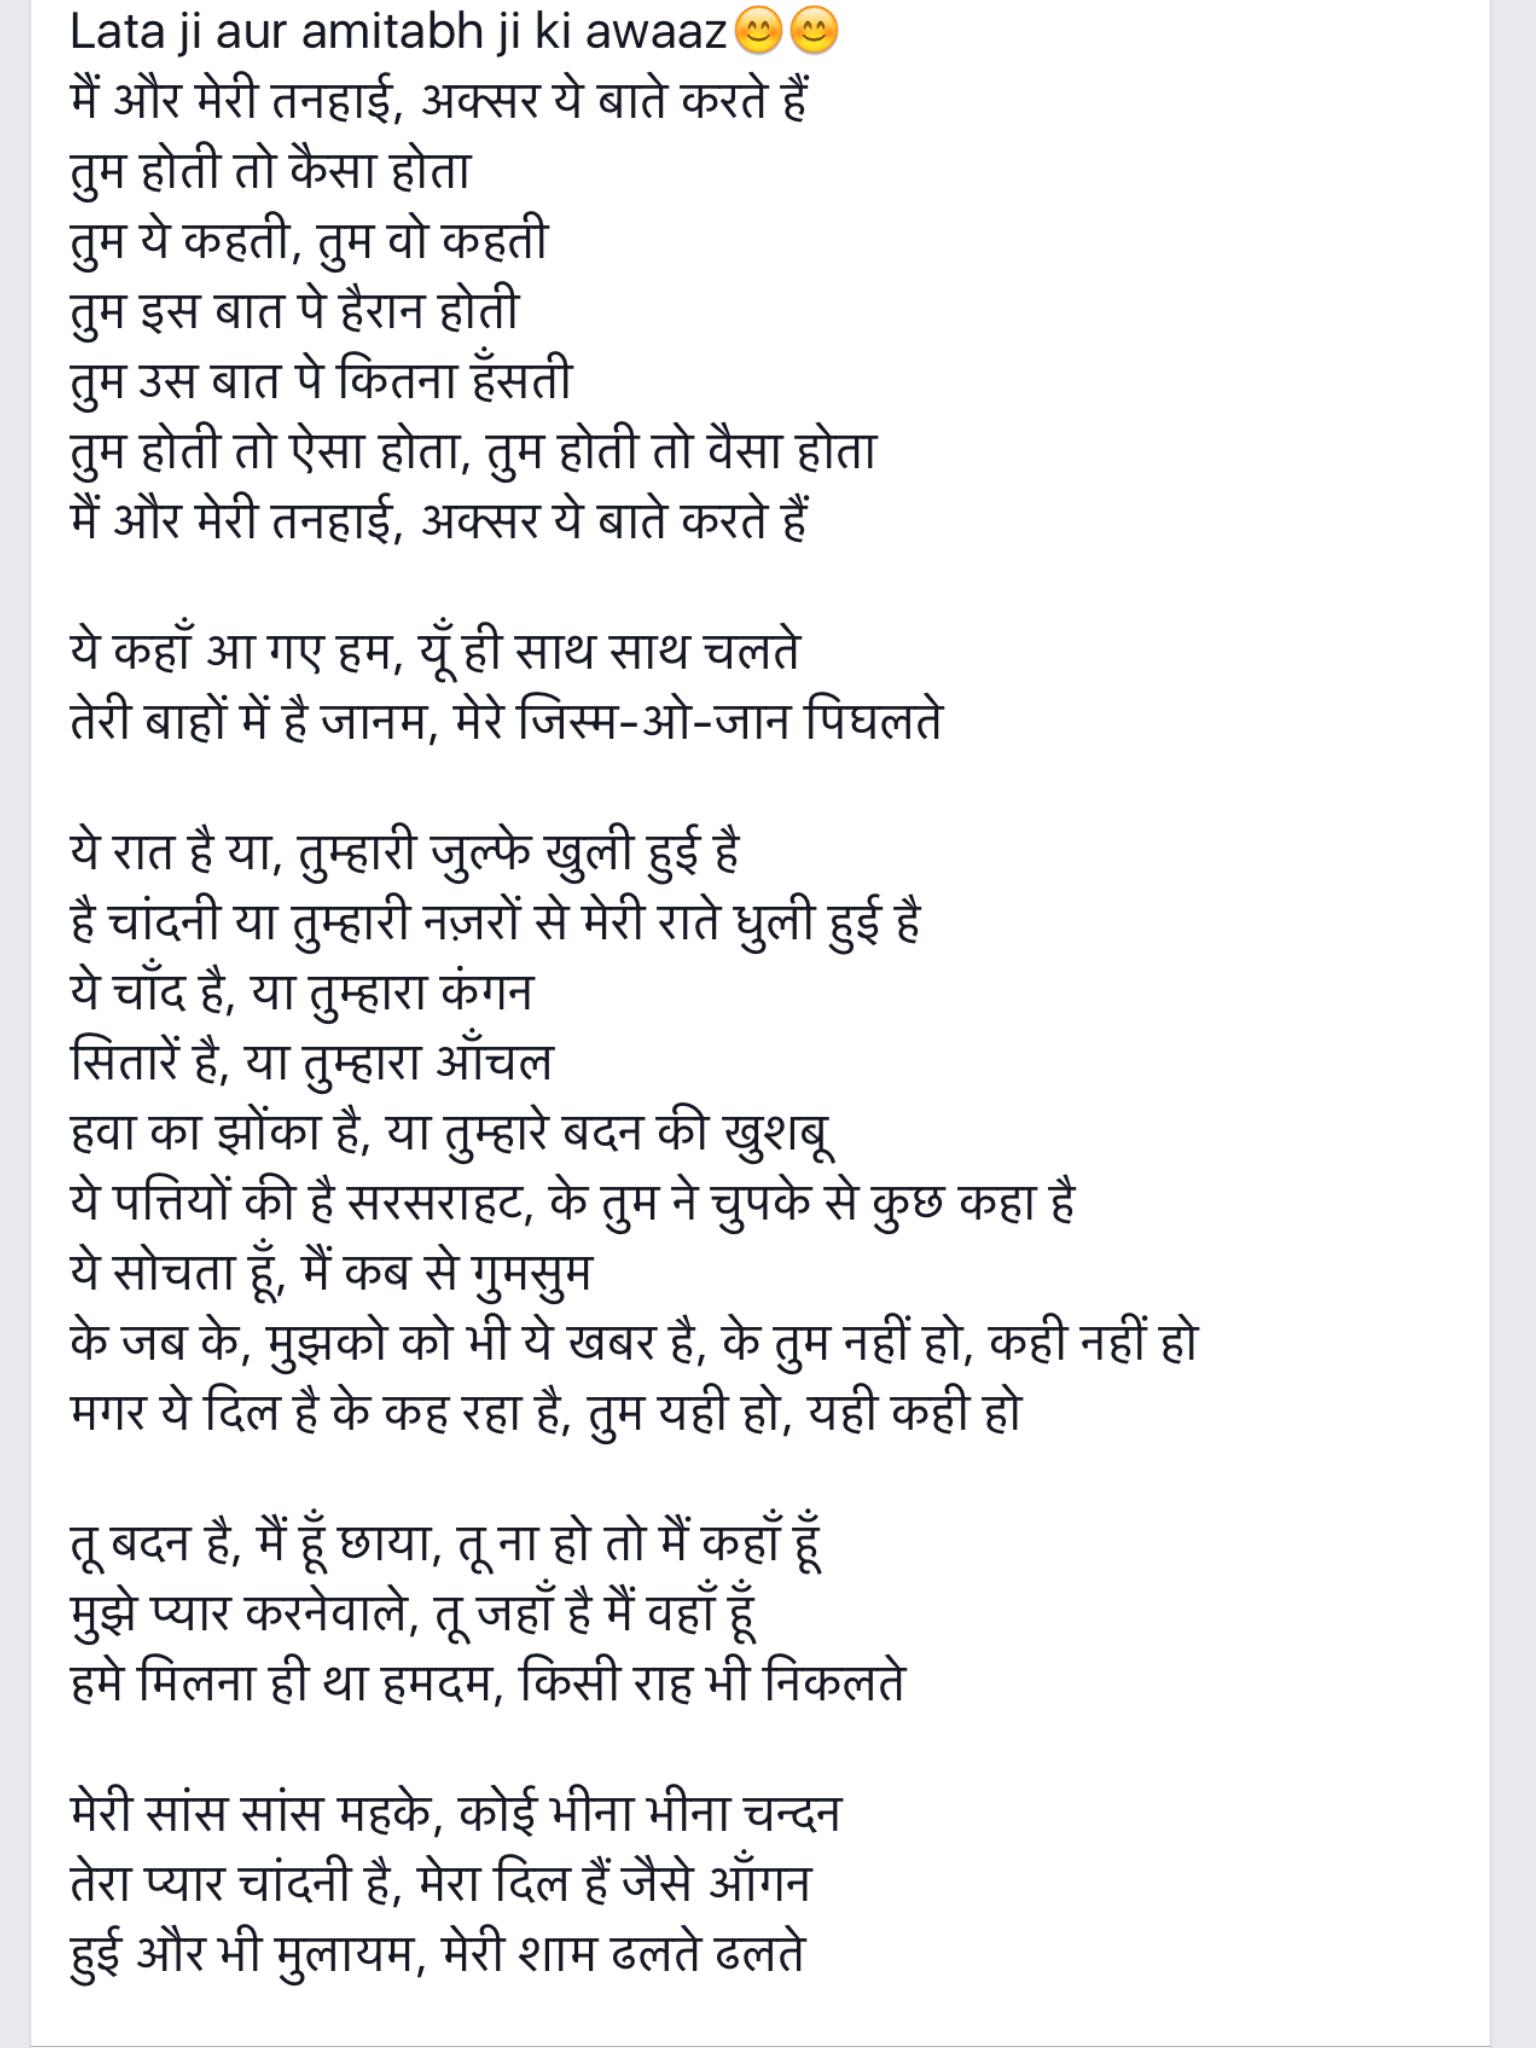 Pin By Dipti Mayee On Hindi Songs And Lyrics Old Song Lyrics Hindi Old Songs Love Songs Lyrics Female model required for hindi movie by senger movies & entertainment. pinterest